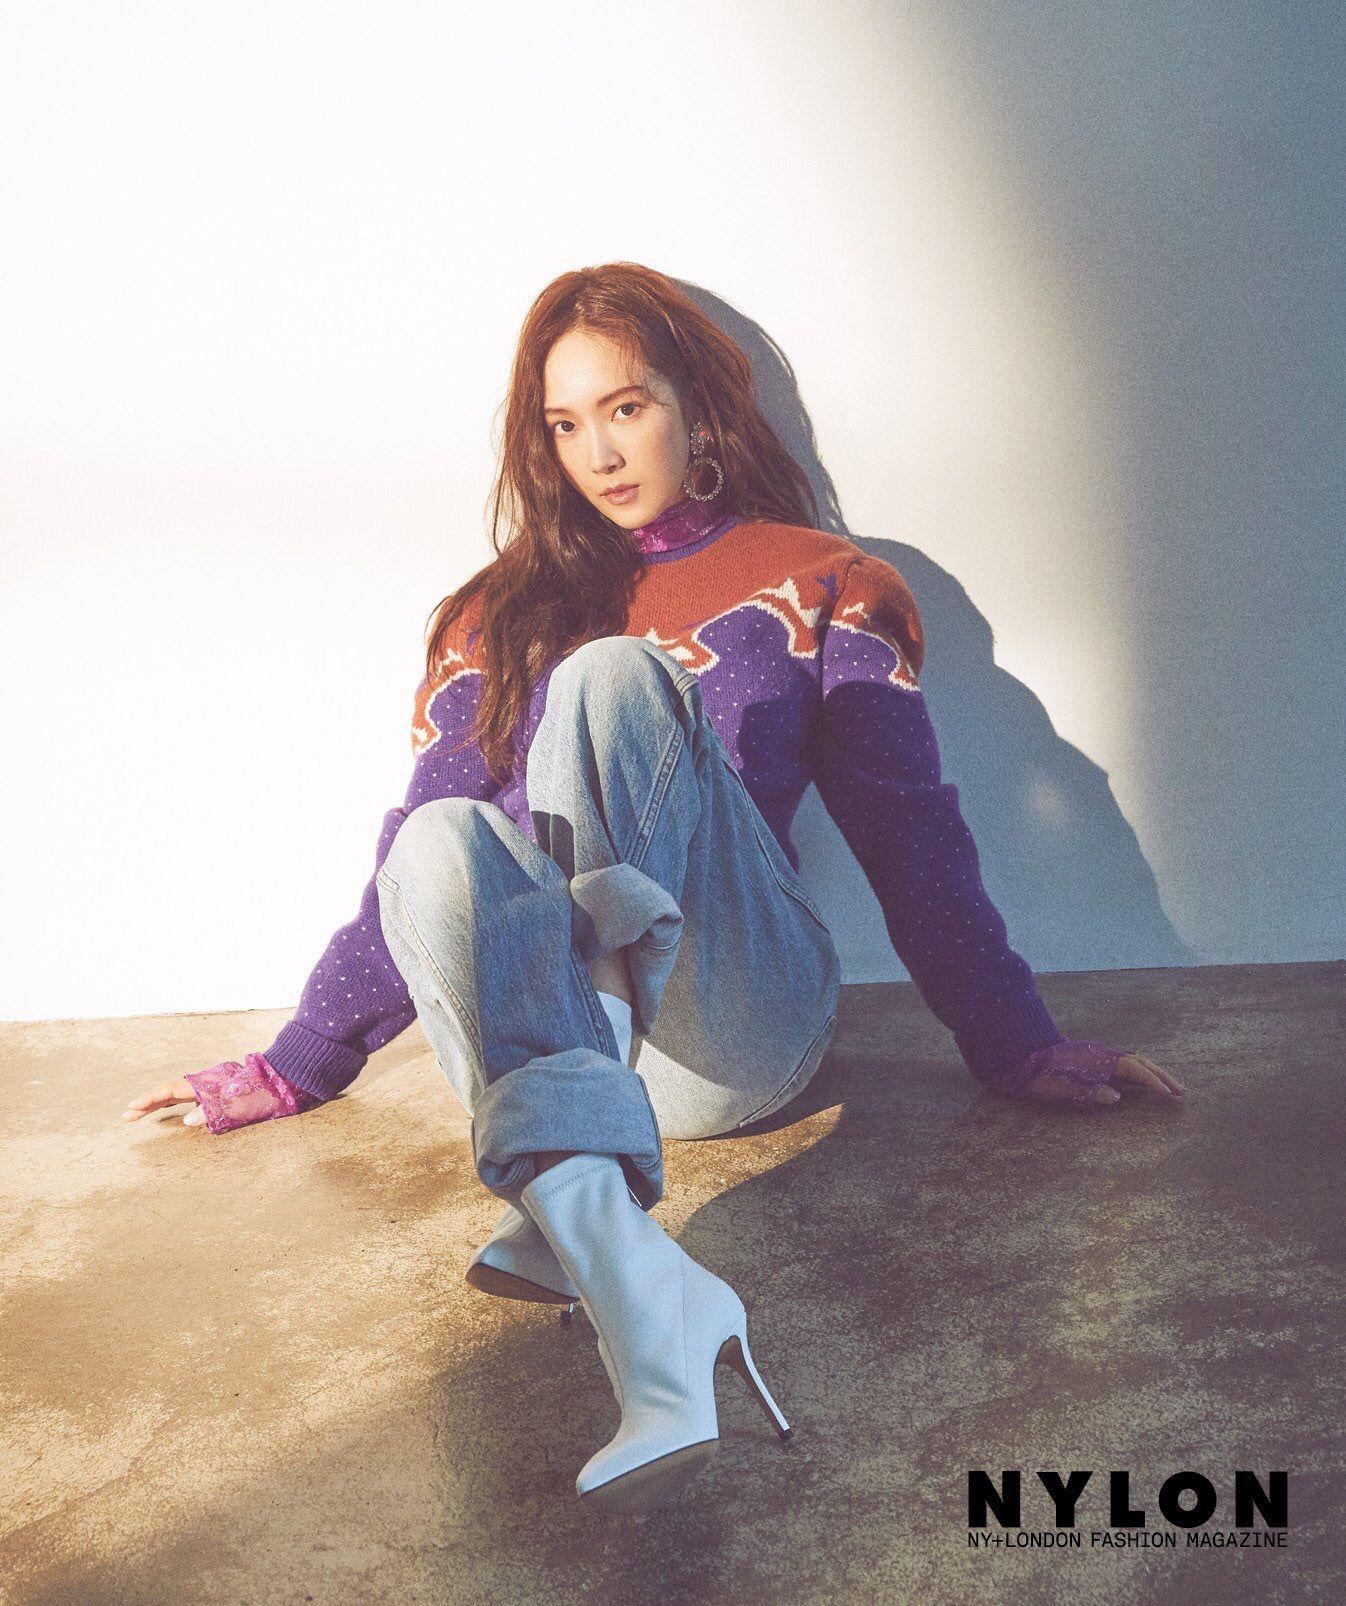 Jessica 2018 In 2019 Girls Generation Jessica Girls